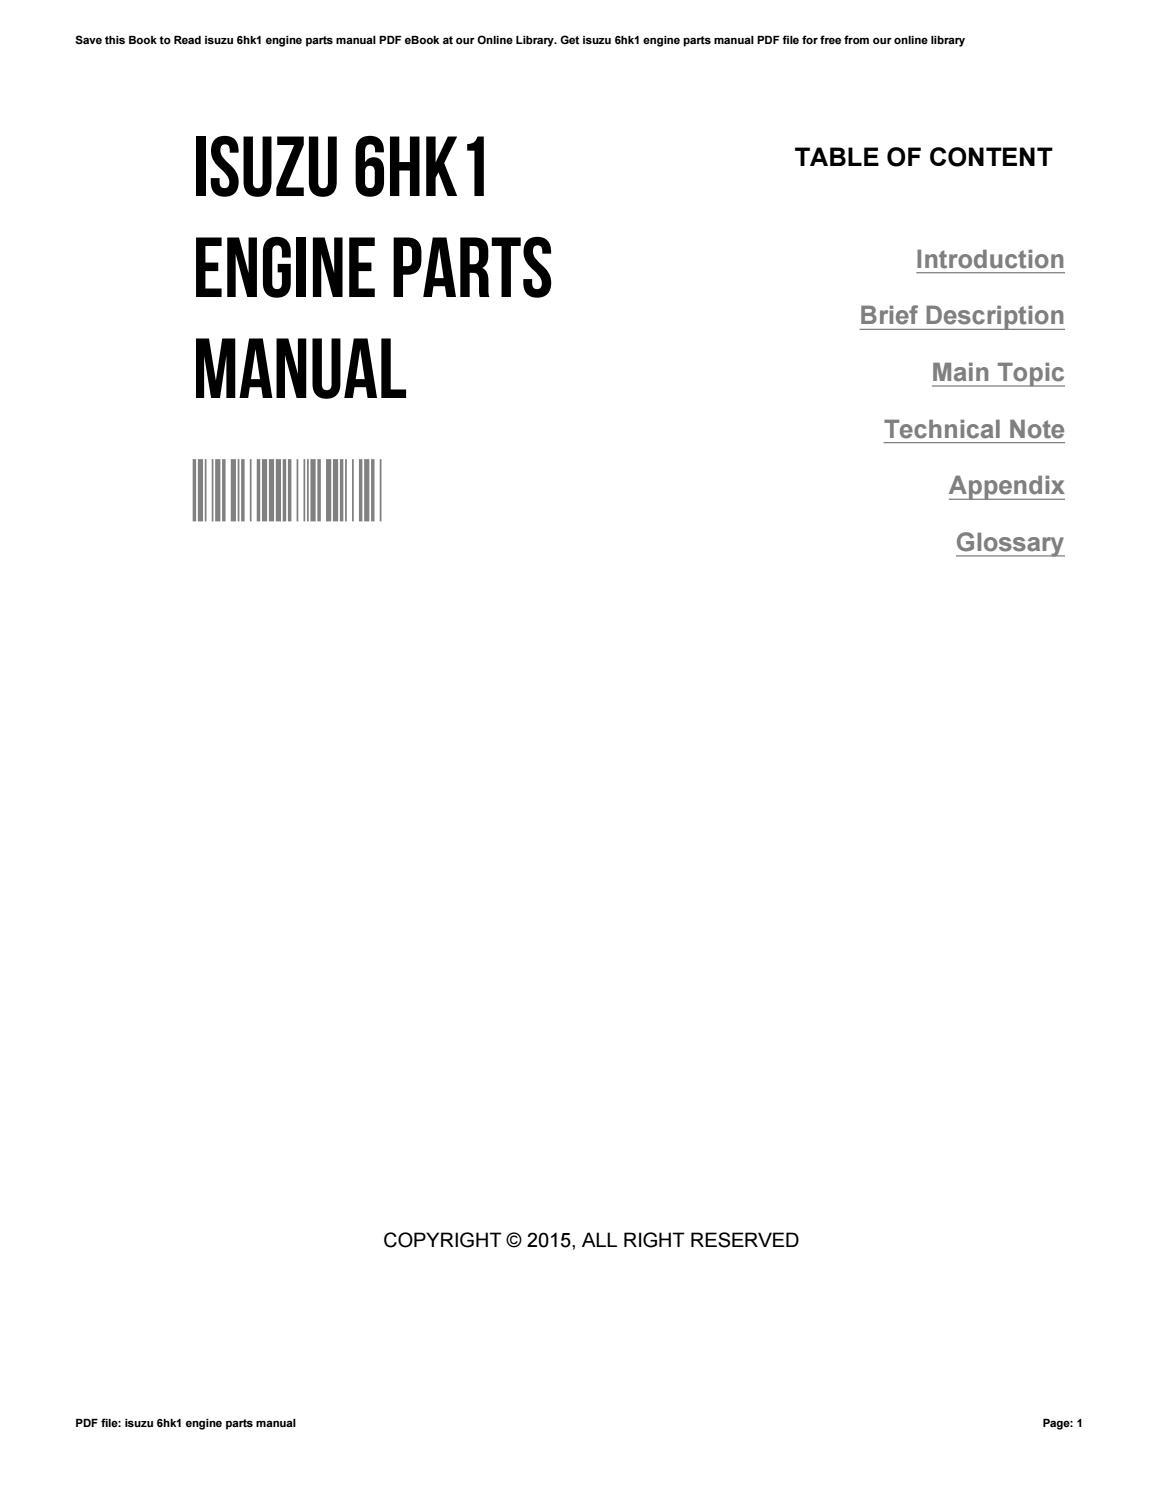 isuzu 6hk1 engine parts manual